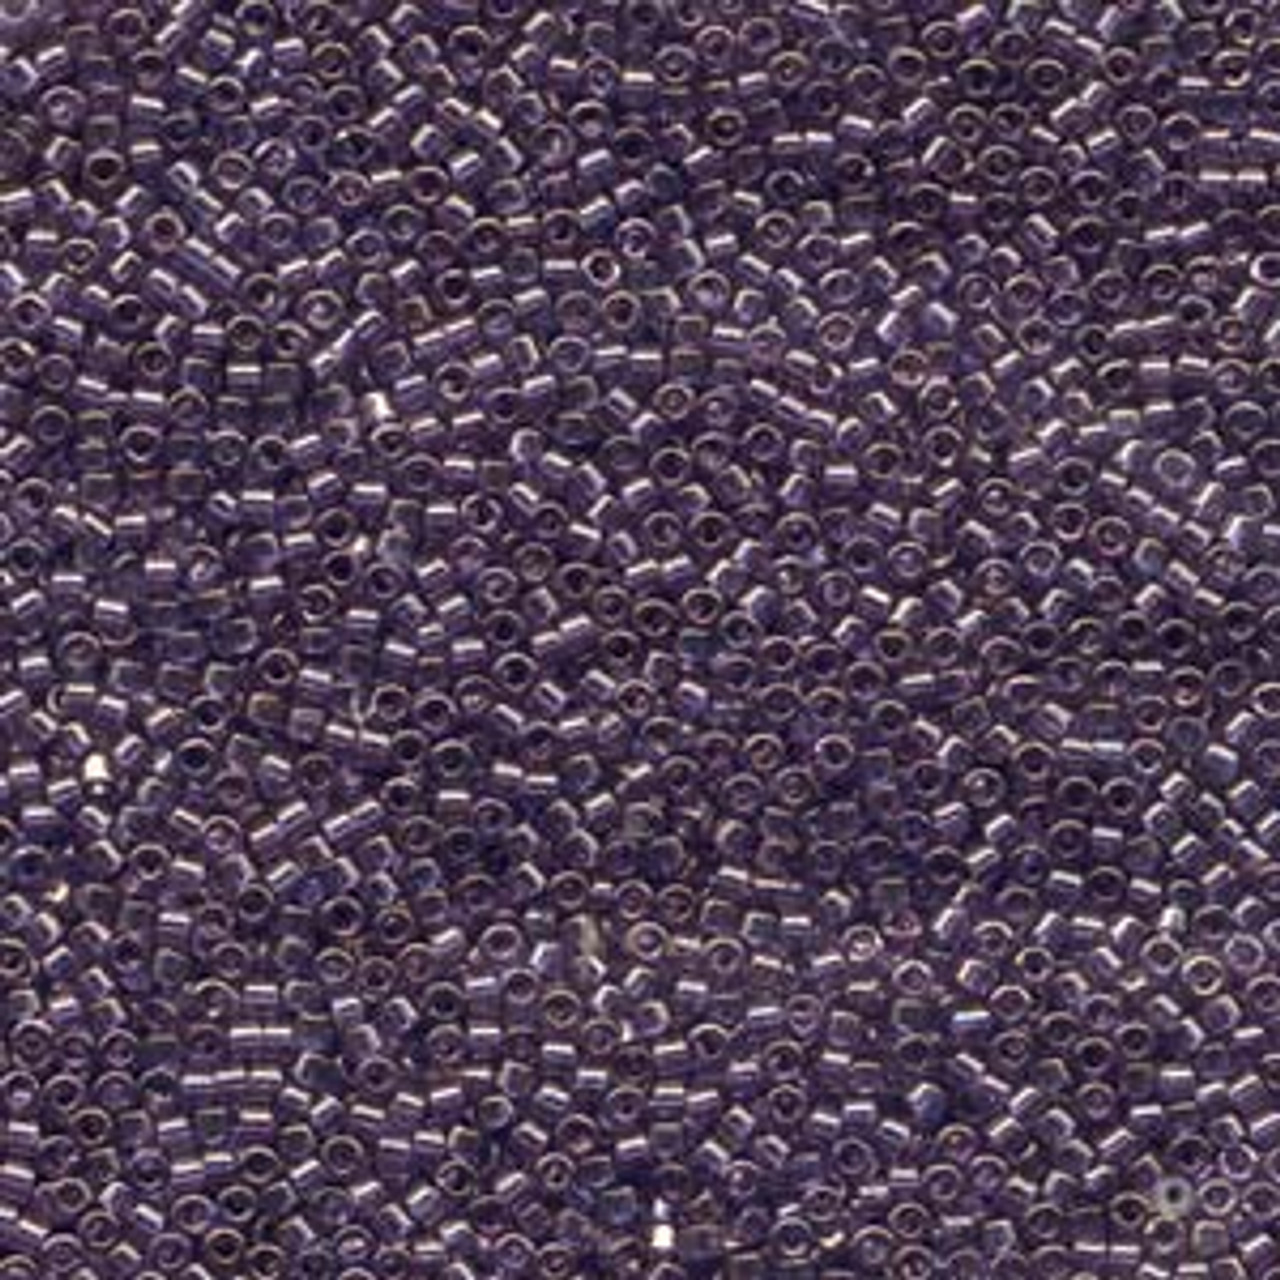 Lavender Blue Gold Luster 11/0 Delica Beads db117 (8 Grams)